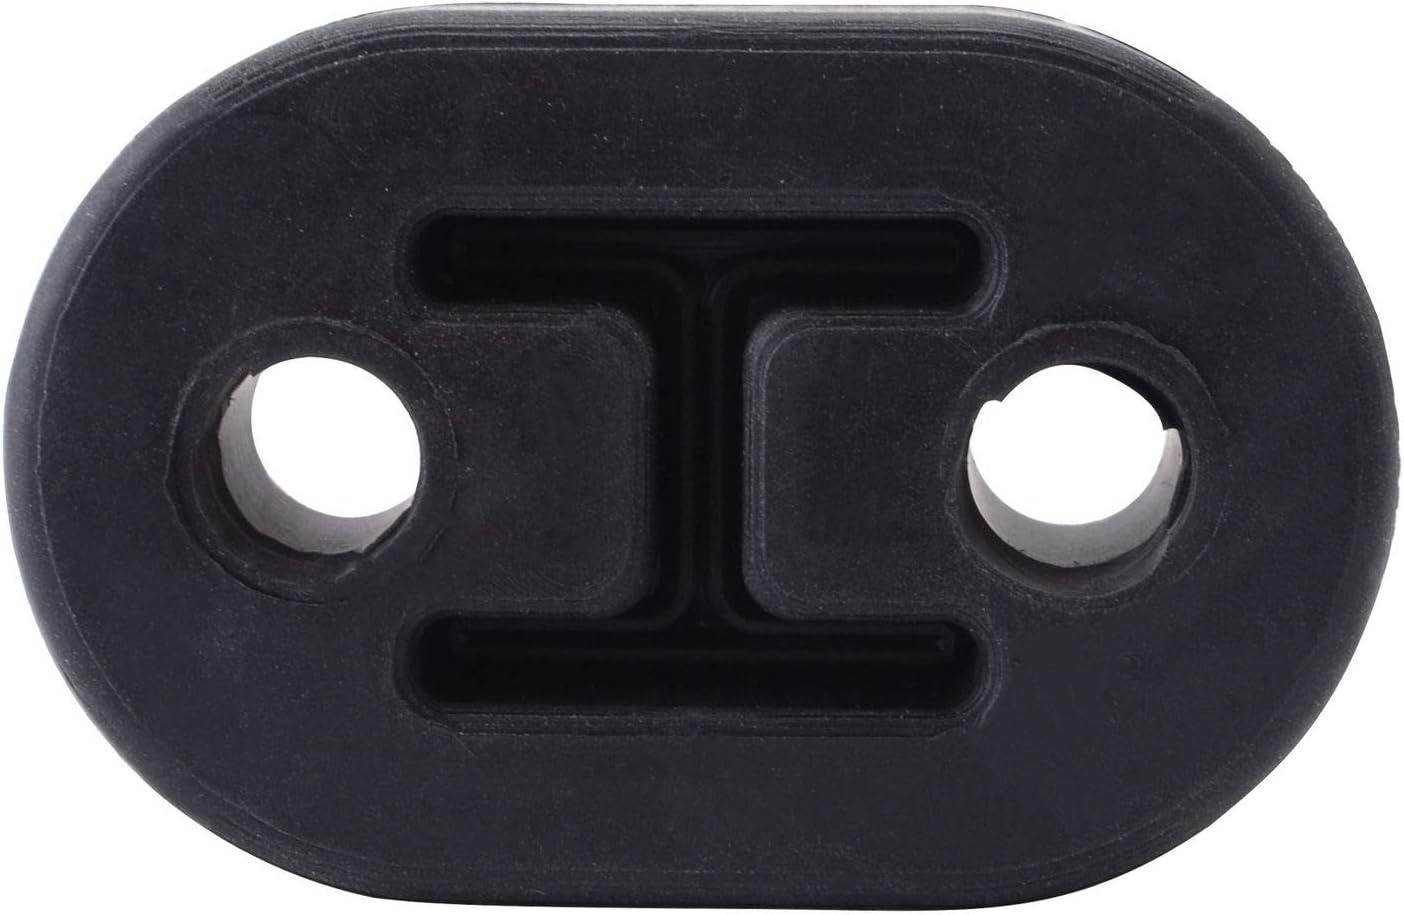 ANTS PART 2 Holes Car Exhaust Rubber Hanger Mount Bushing Muffler Insulator Shock Absorbent Replacement Support Bracket Red